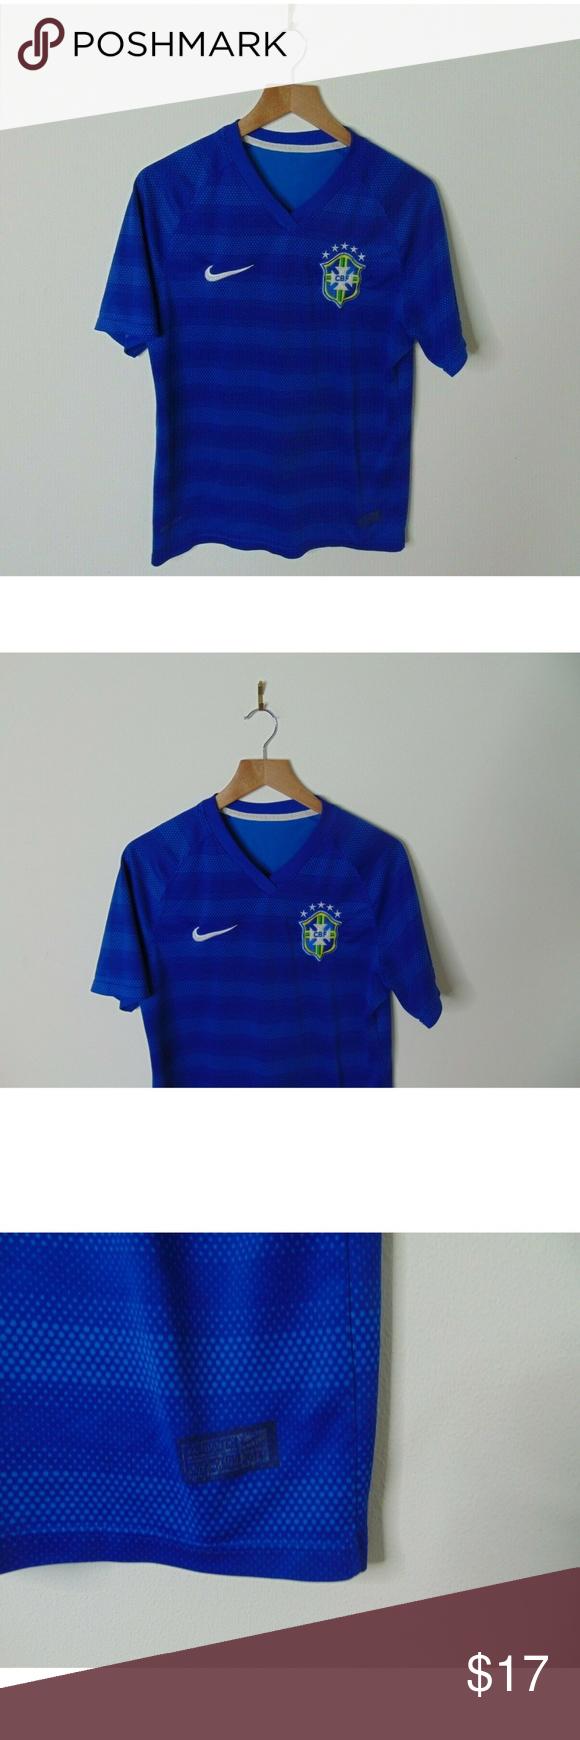 Nike Mens Shirt Short Sleeve Dri-Fit Brazil Soccer Football Blue Variety